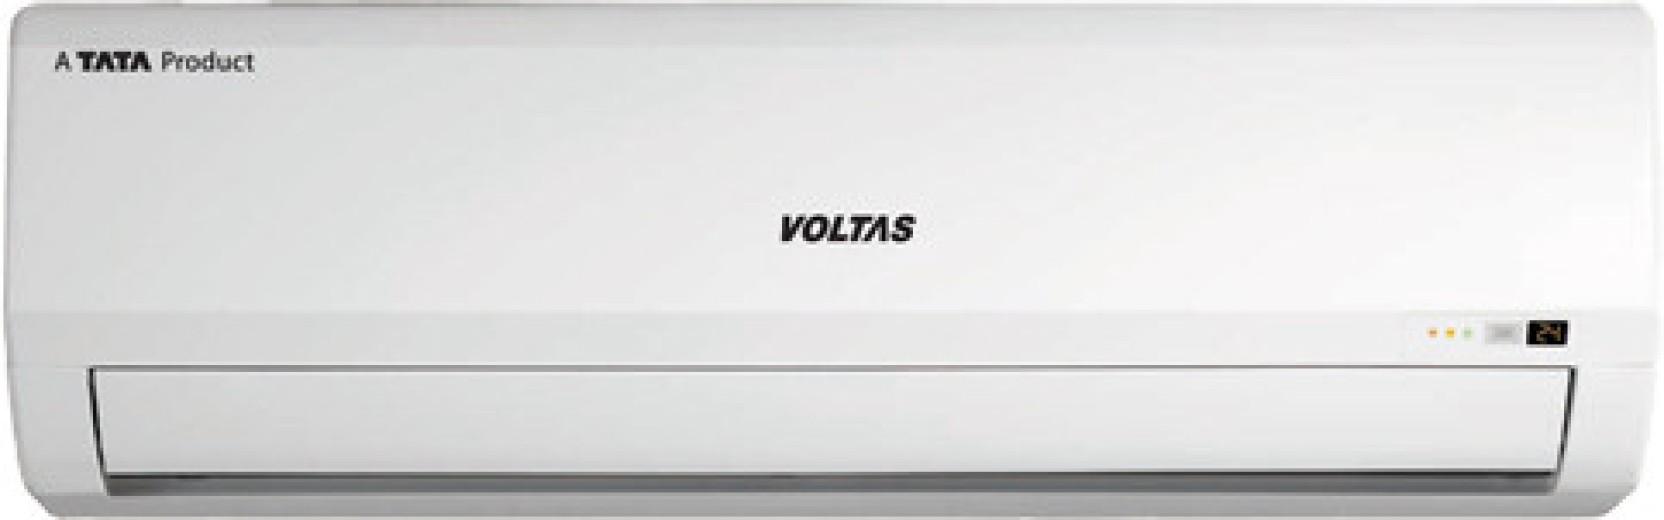 Voltas 1.2 Ton 5 Star Split AC Sale (155CY)